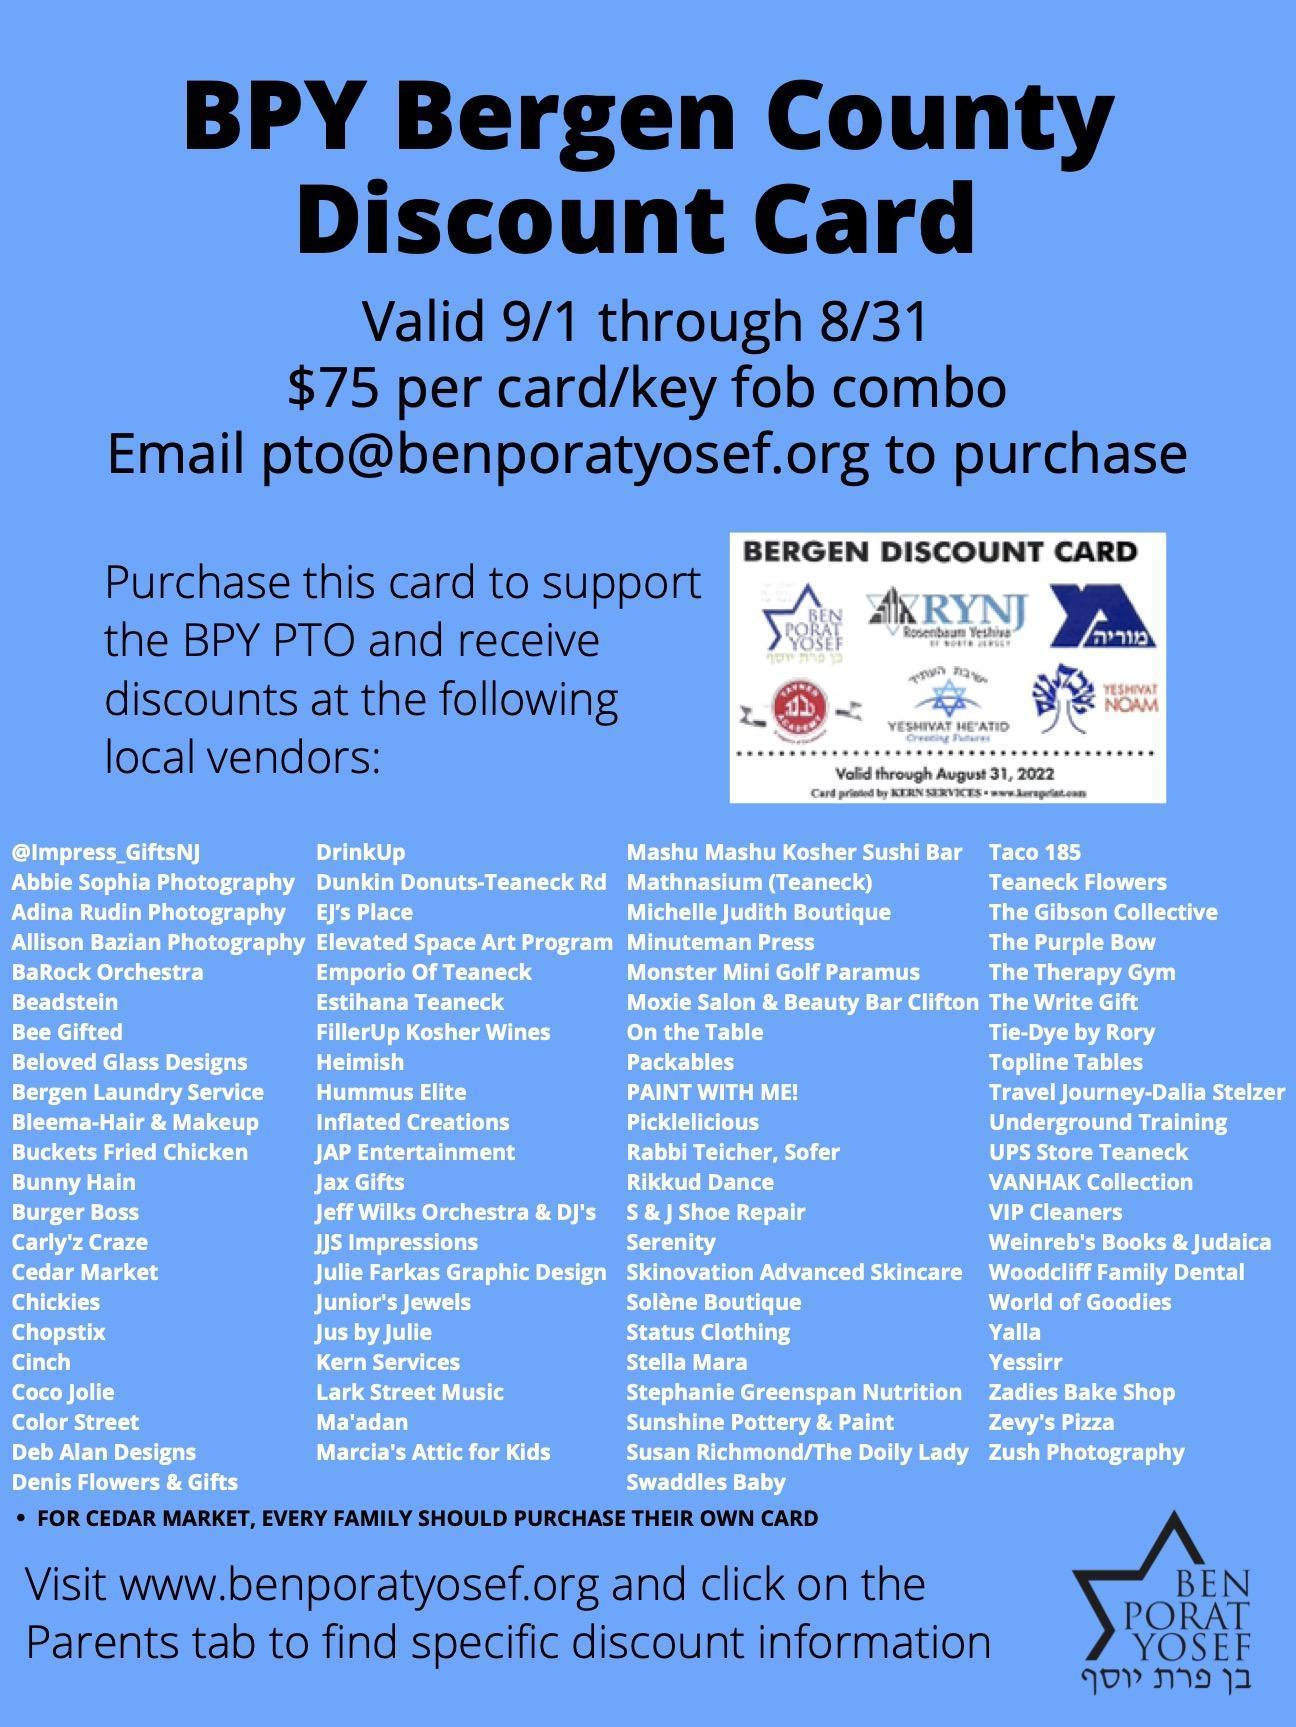 Flyer regarding discount card